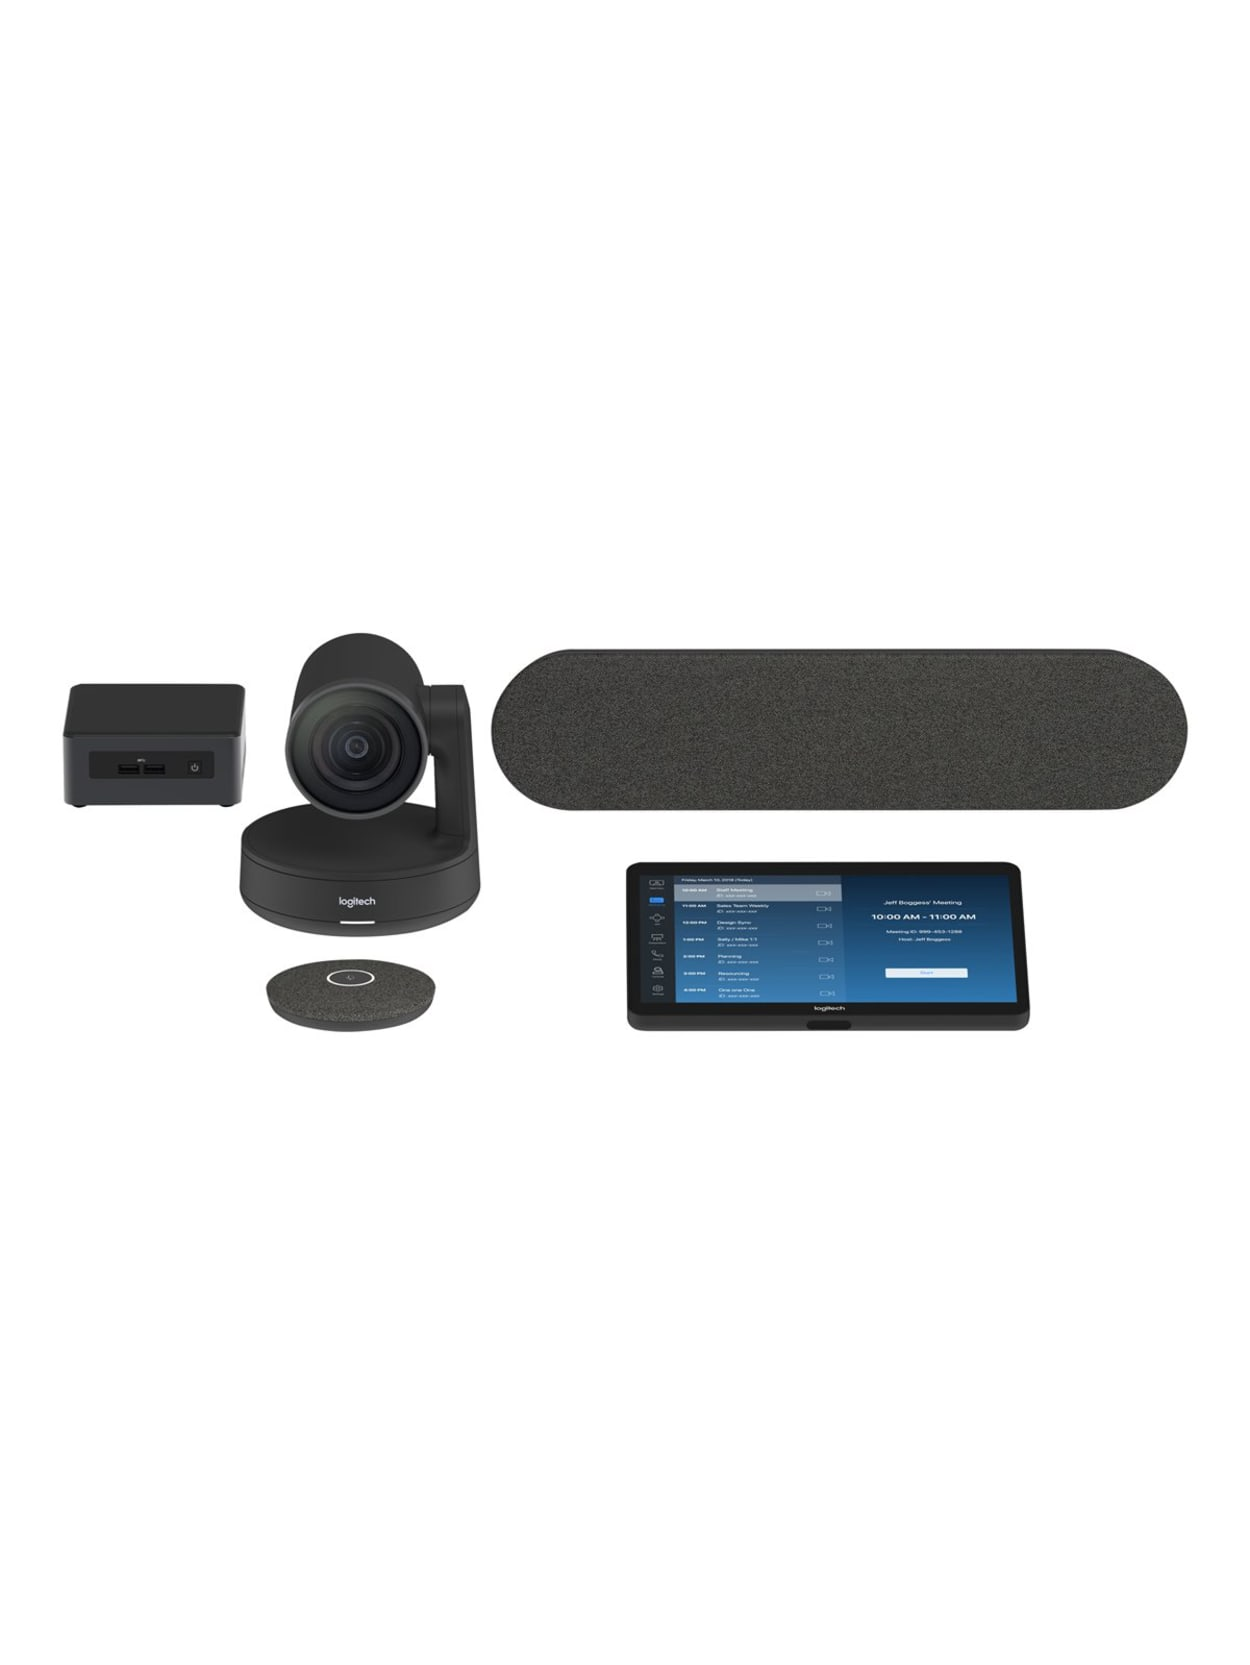 Logitech Video Conference Equipment 3840 X 2160 Video Live 4k Uhd